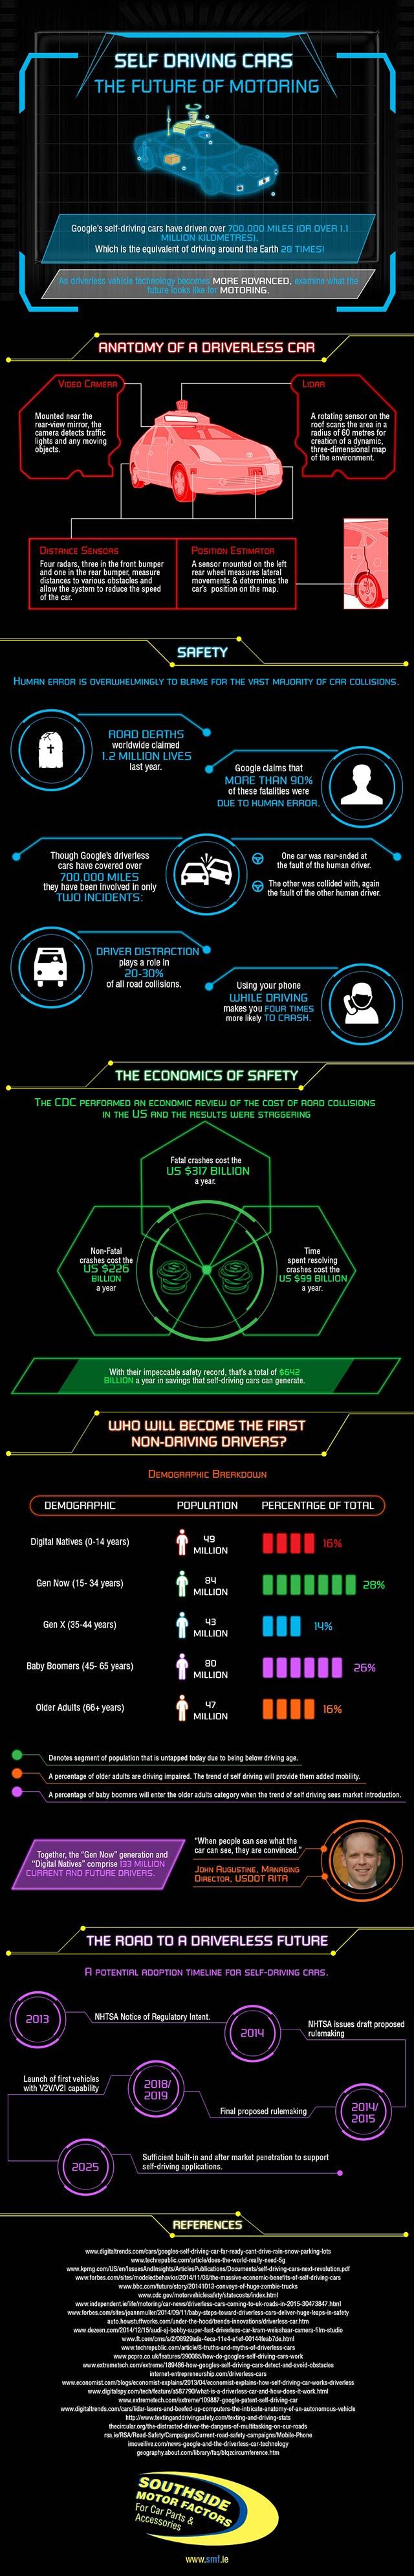 Self-Driving-Cars-IG